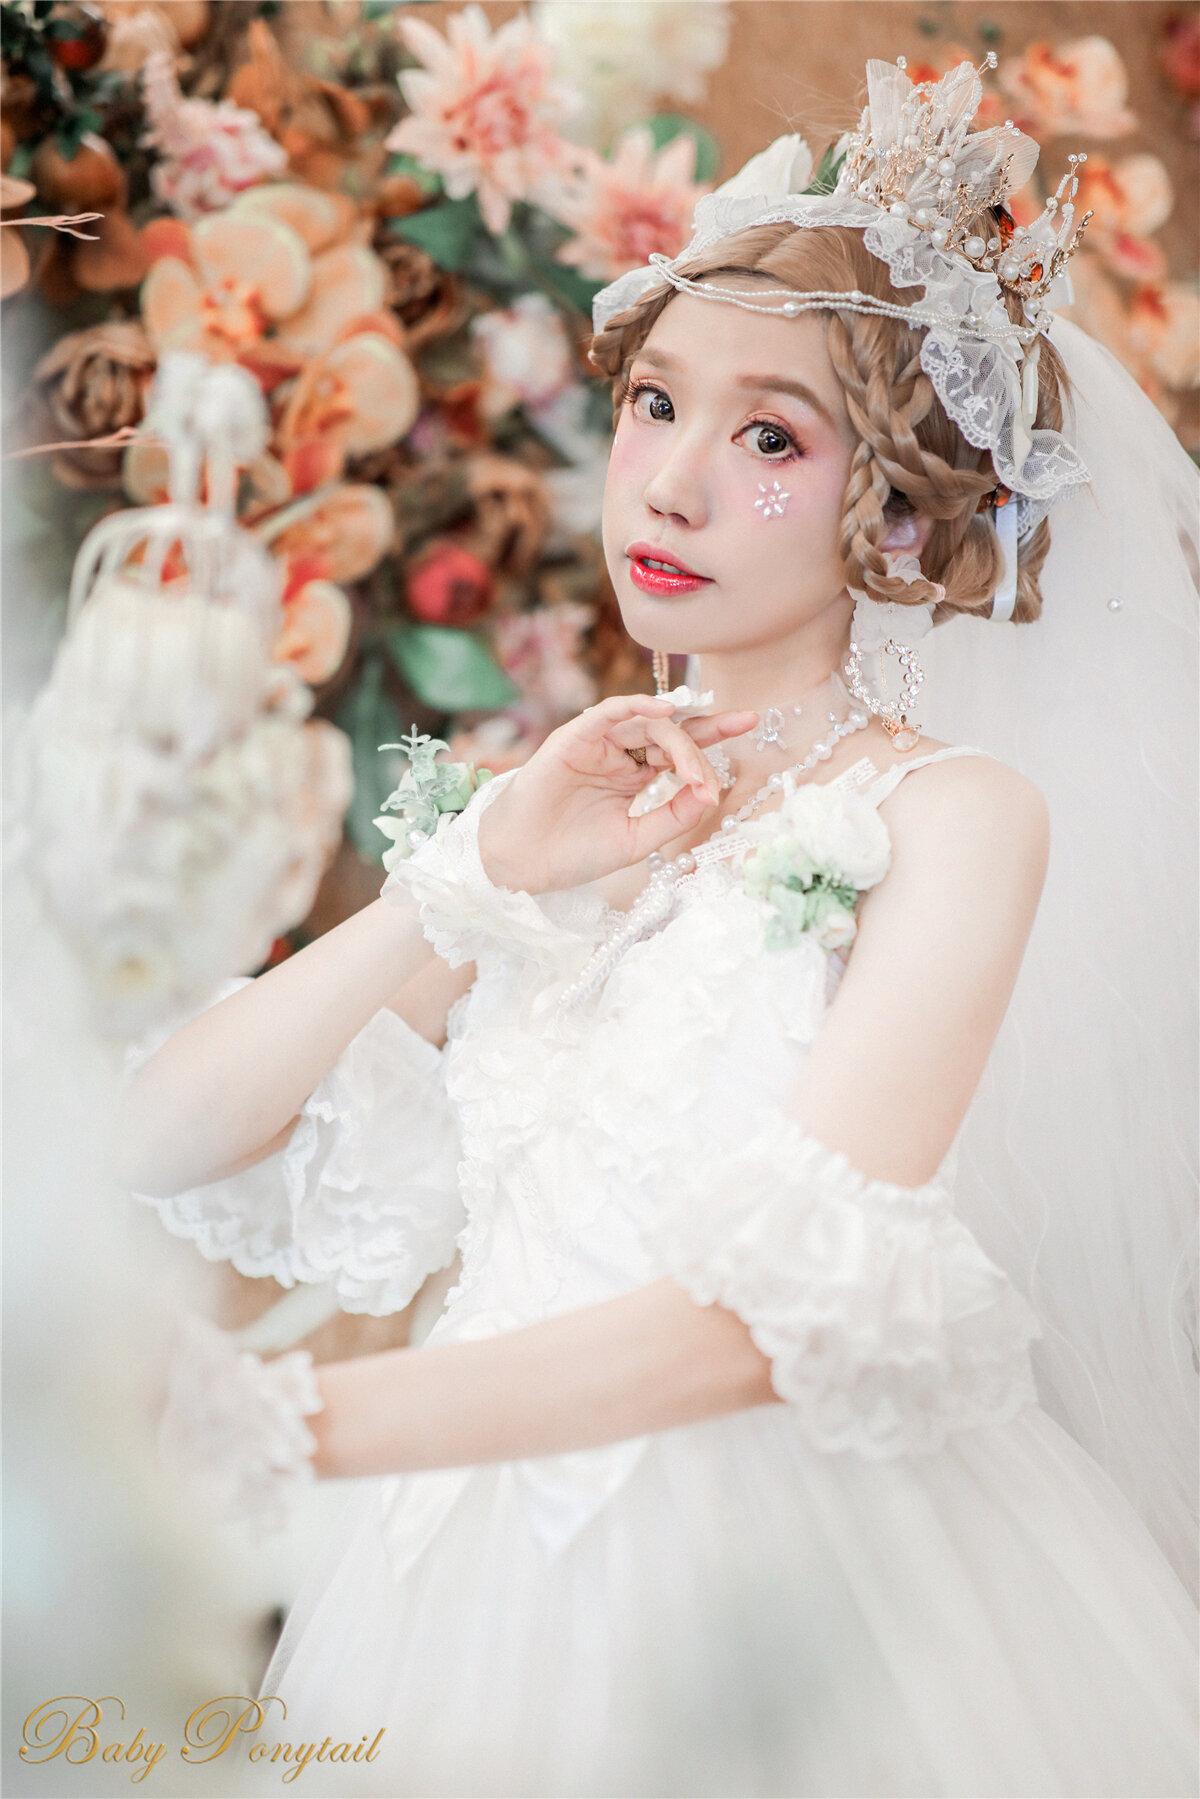 Babyponytail_Heavenly Teardrops_Model photo_JSK white_kaka_27.jpg